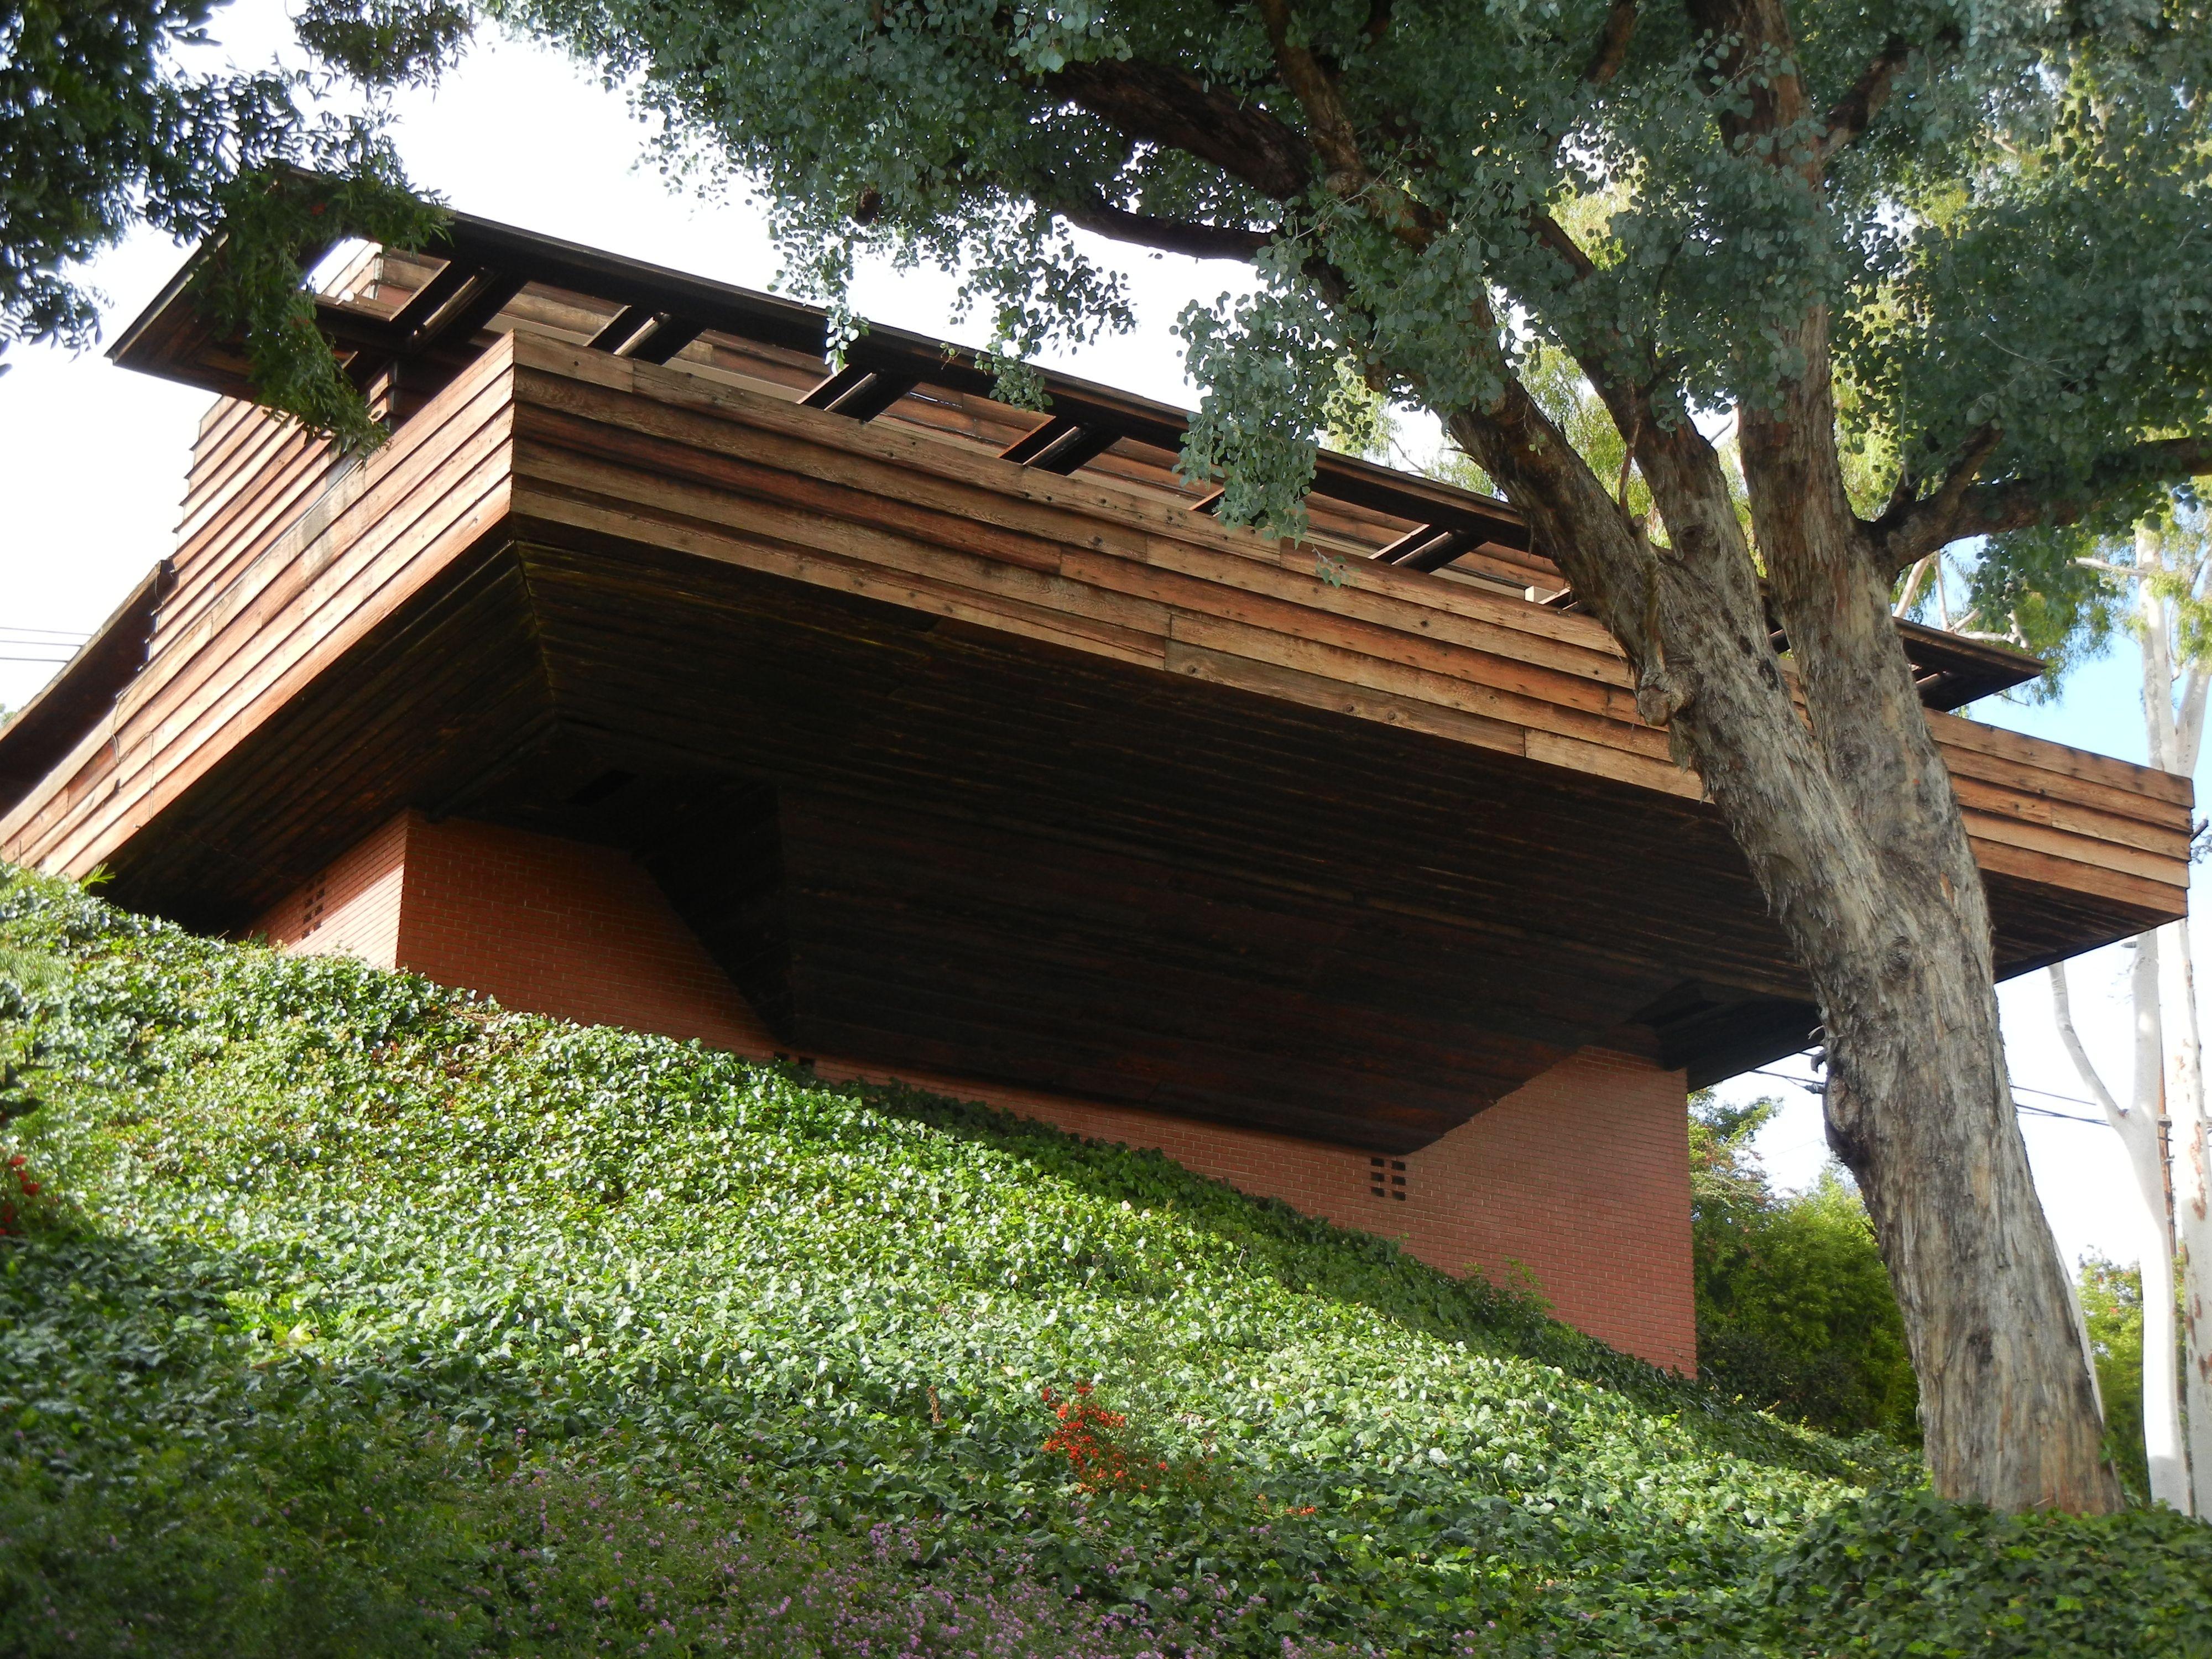 Wright Sturges House Frank Lloyd Wright Frank Lloyd Wright Architecture Usonian Style